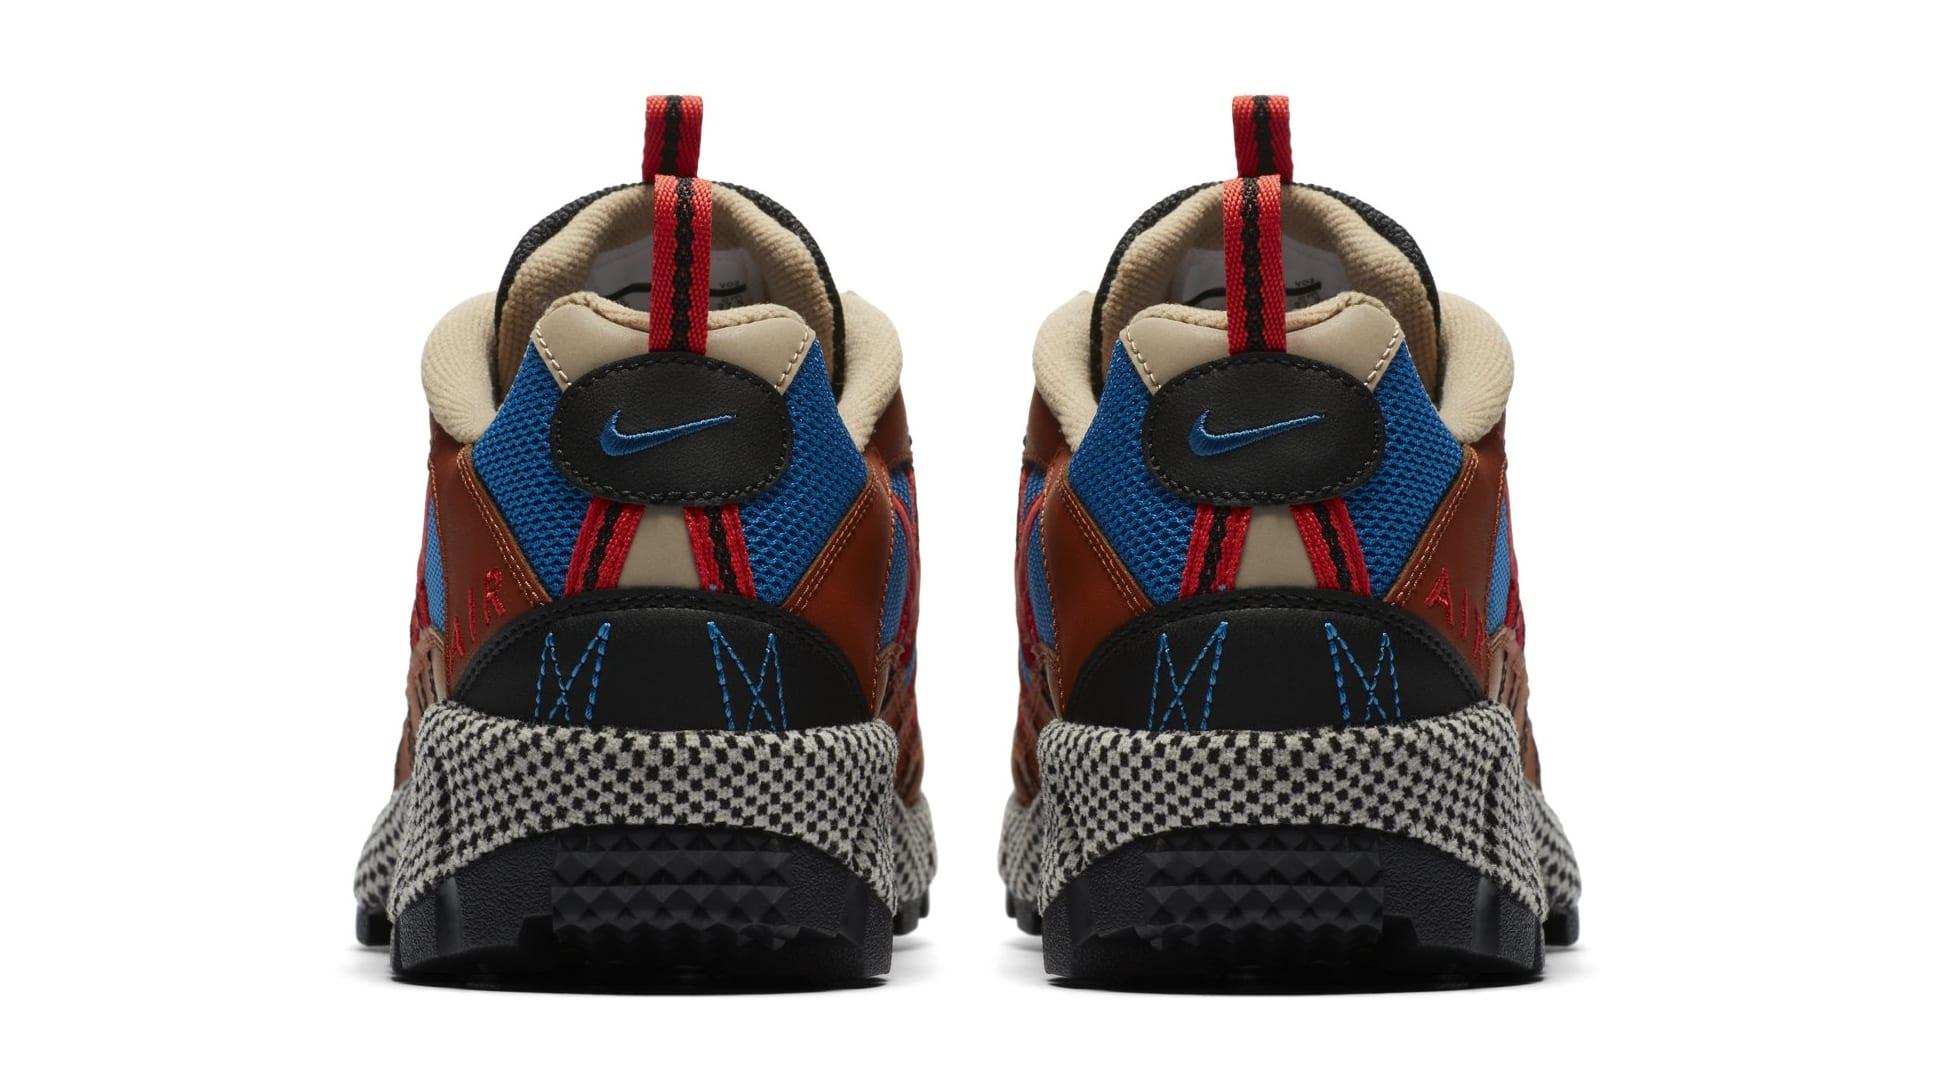 Nike Air Humara 'Dark Russet' AO3297-200 (Heel)